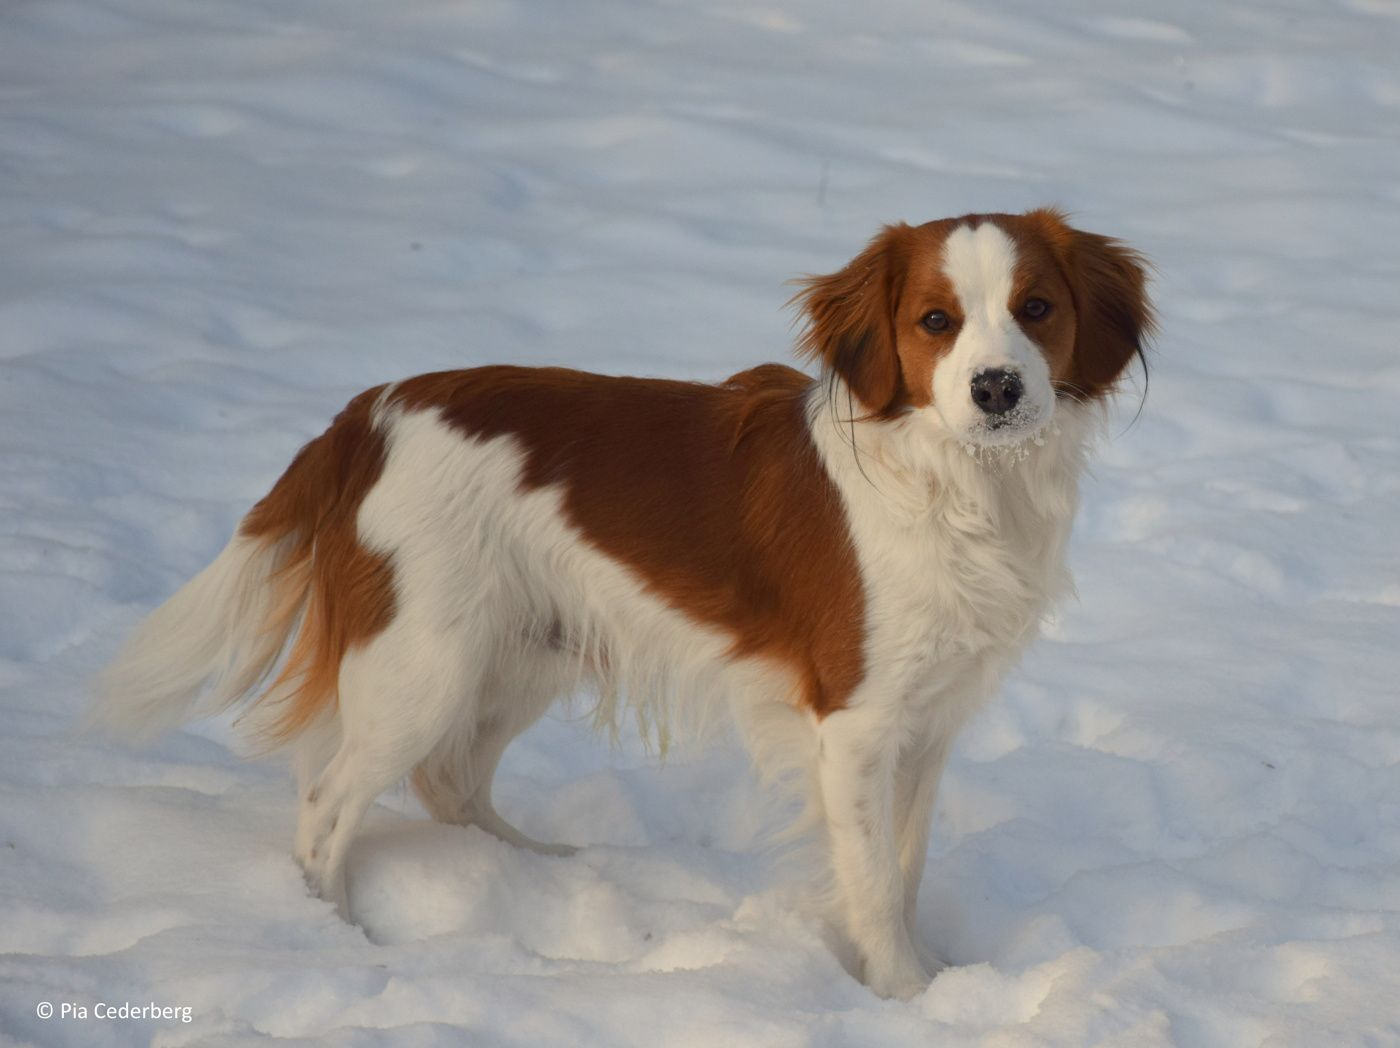 Nederlandse Kooikerhondje Cute Dogs Dogs Dogs And Puppies